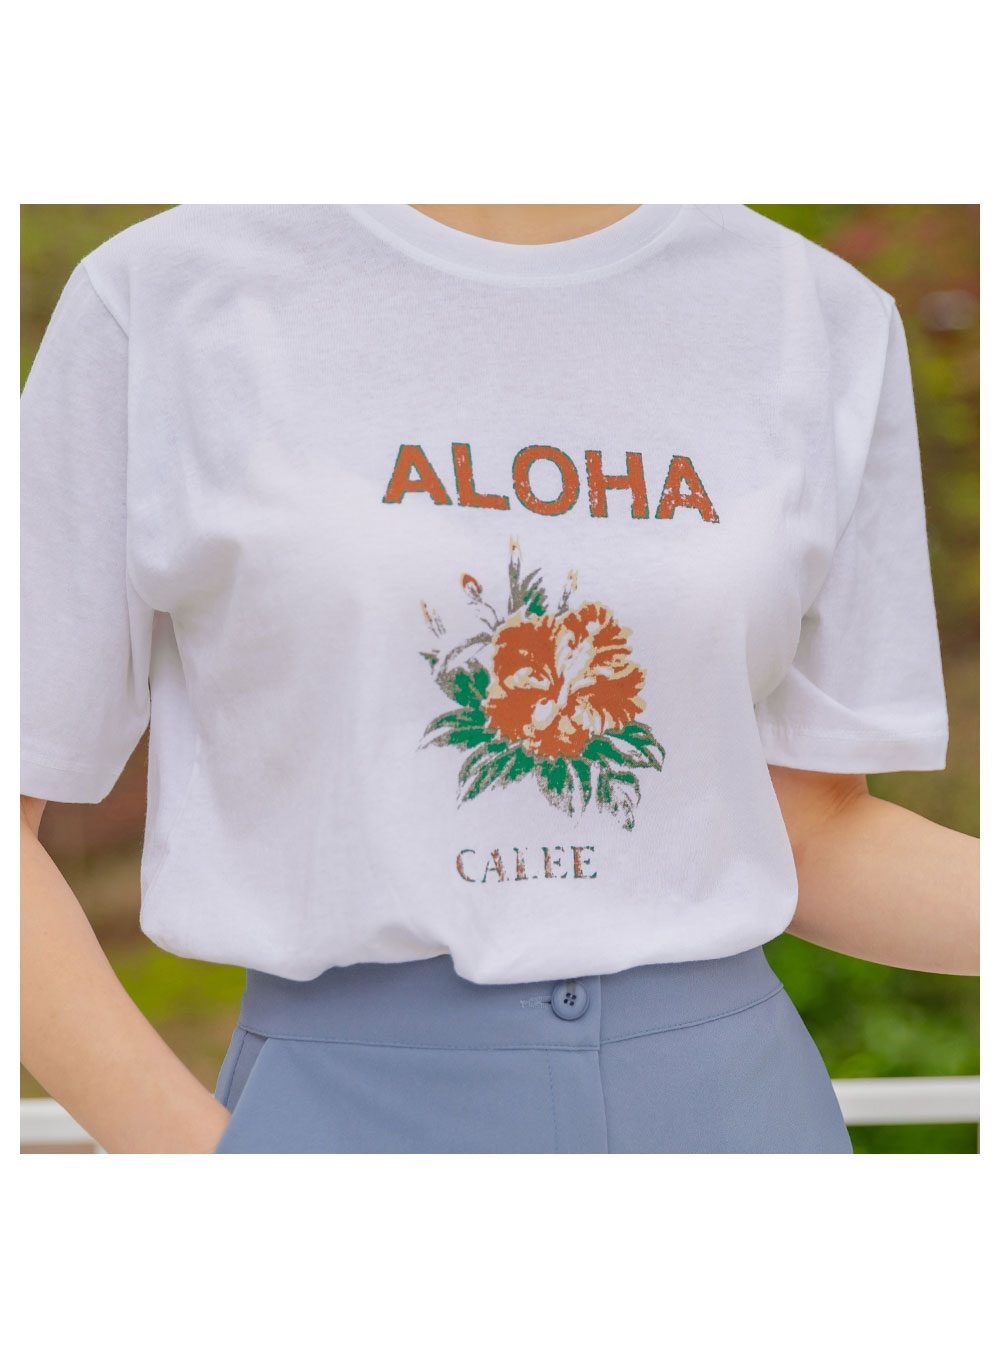 Aloha Loose-fit Short Sleeve Tee